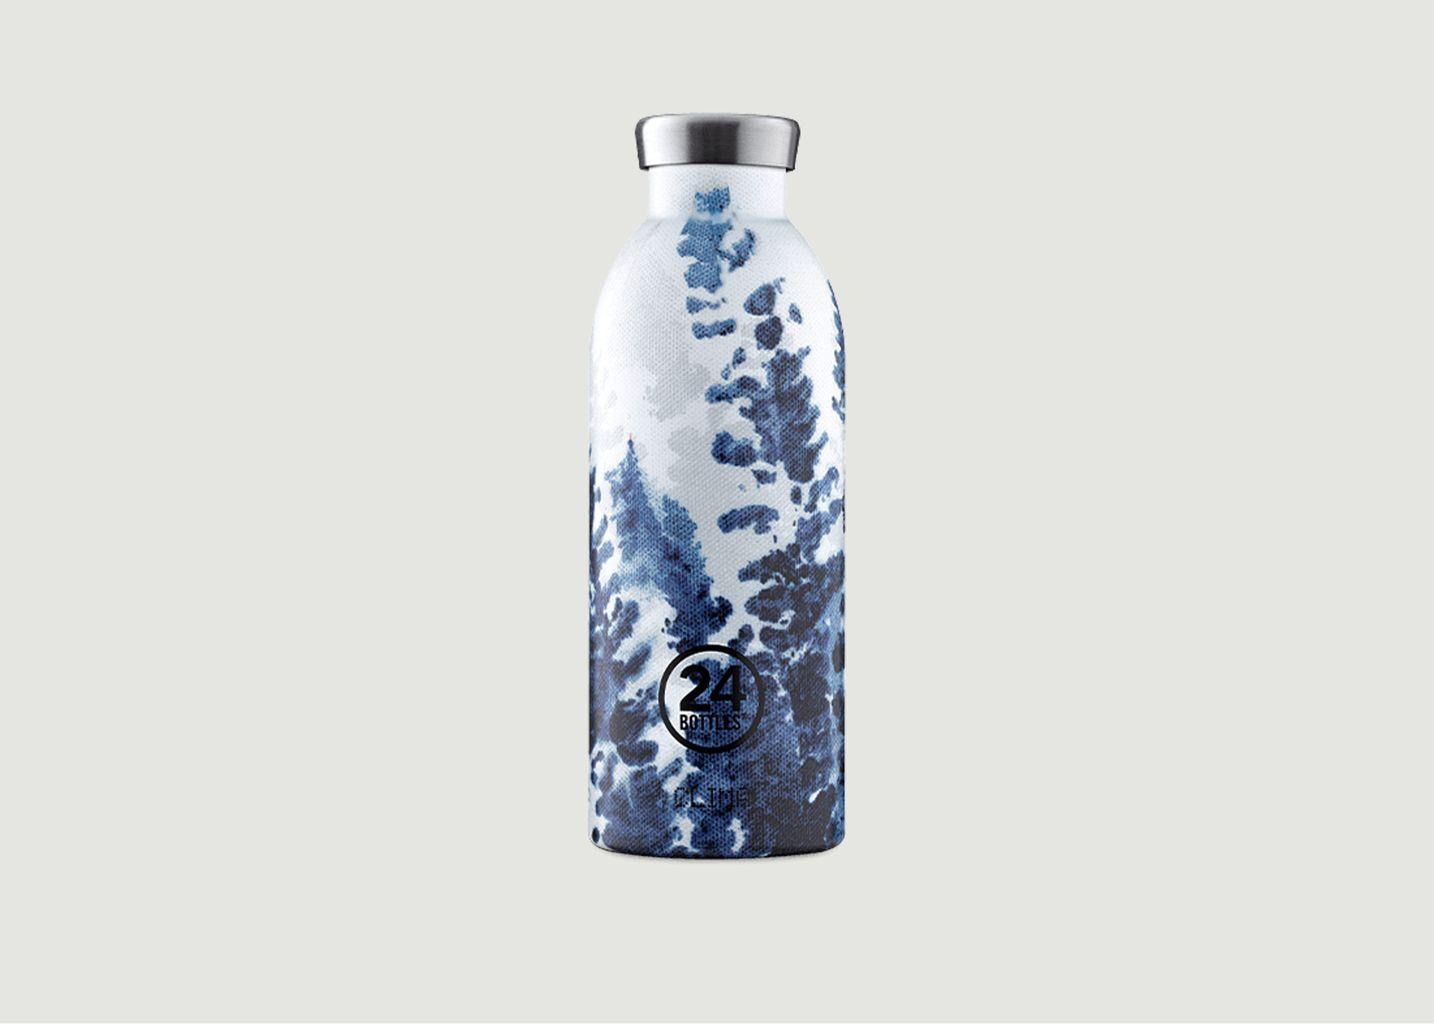 Clima Bottle 500ml Isotherme Hush - 24 Bottles